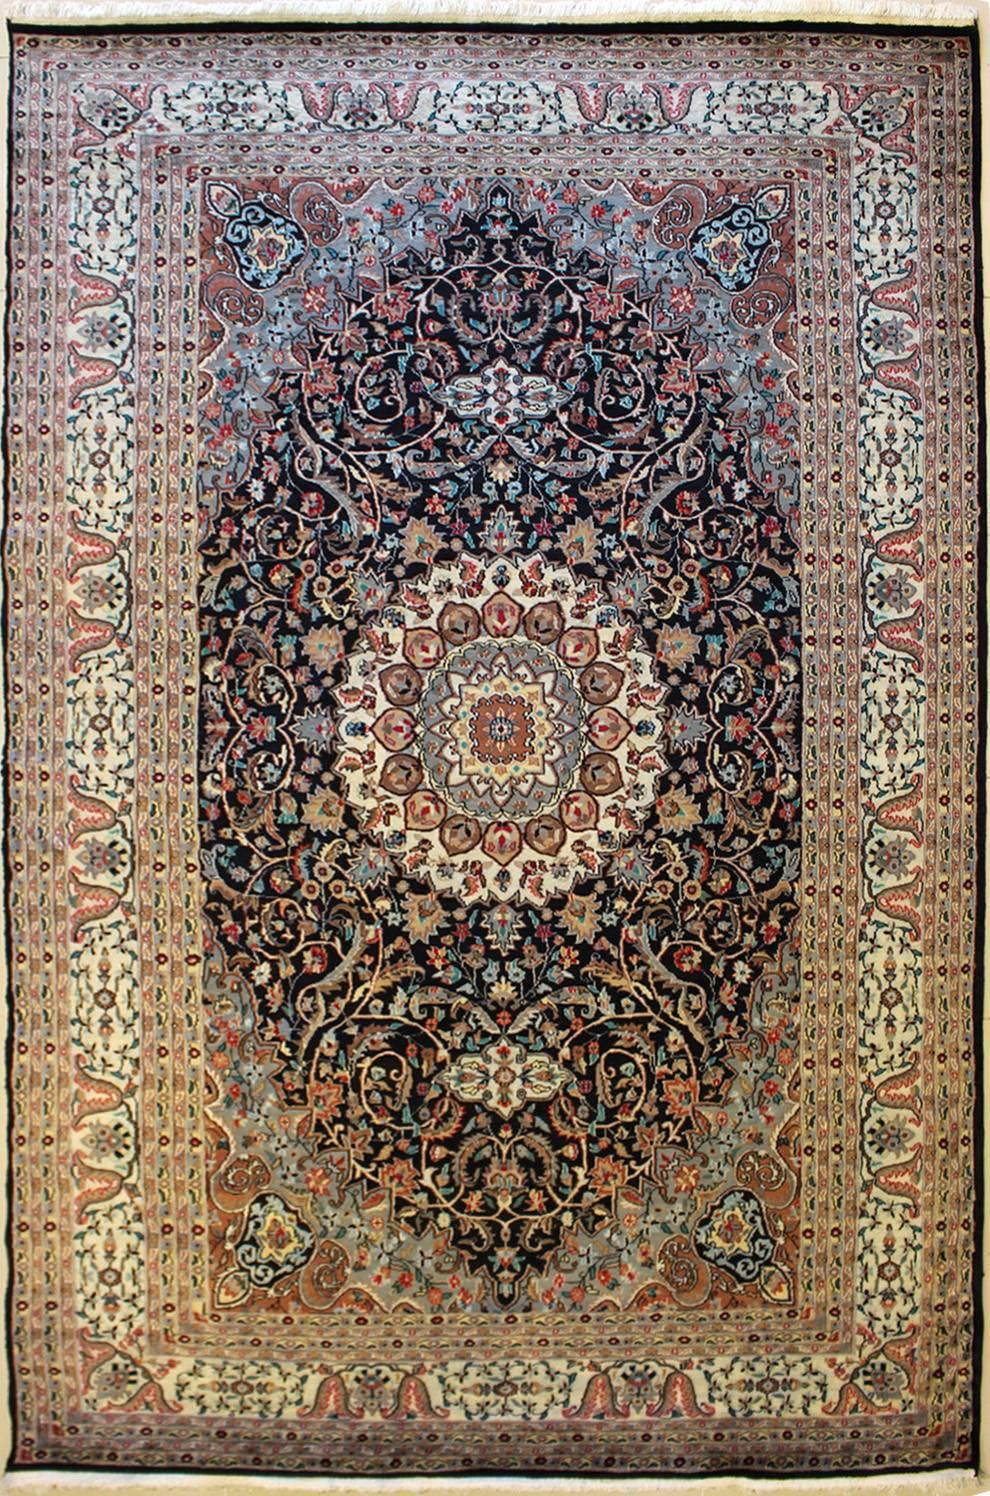 7 39 10x12 39 0 rug ispahan handmade pak persian high